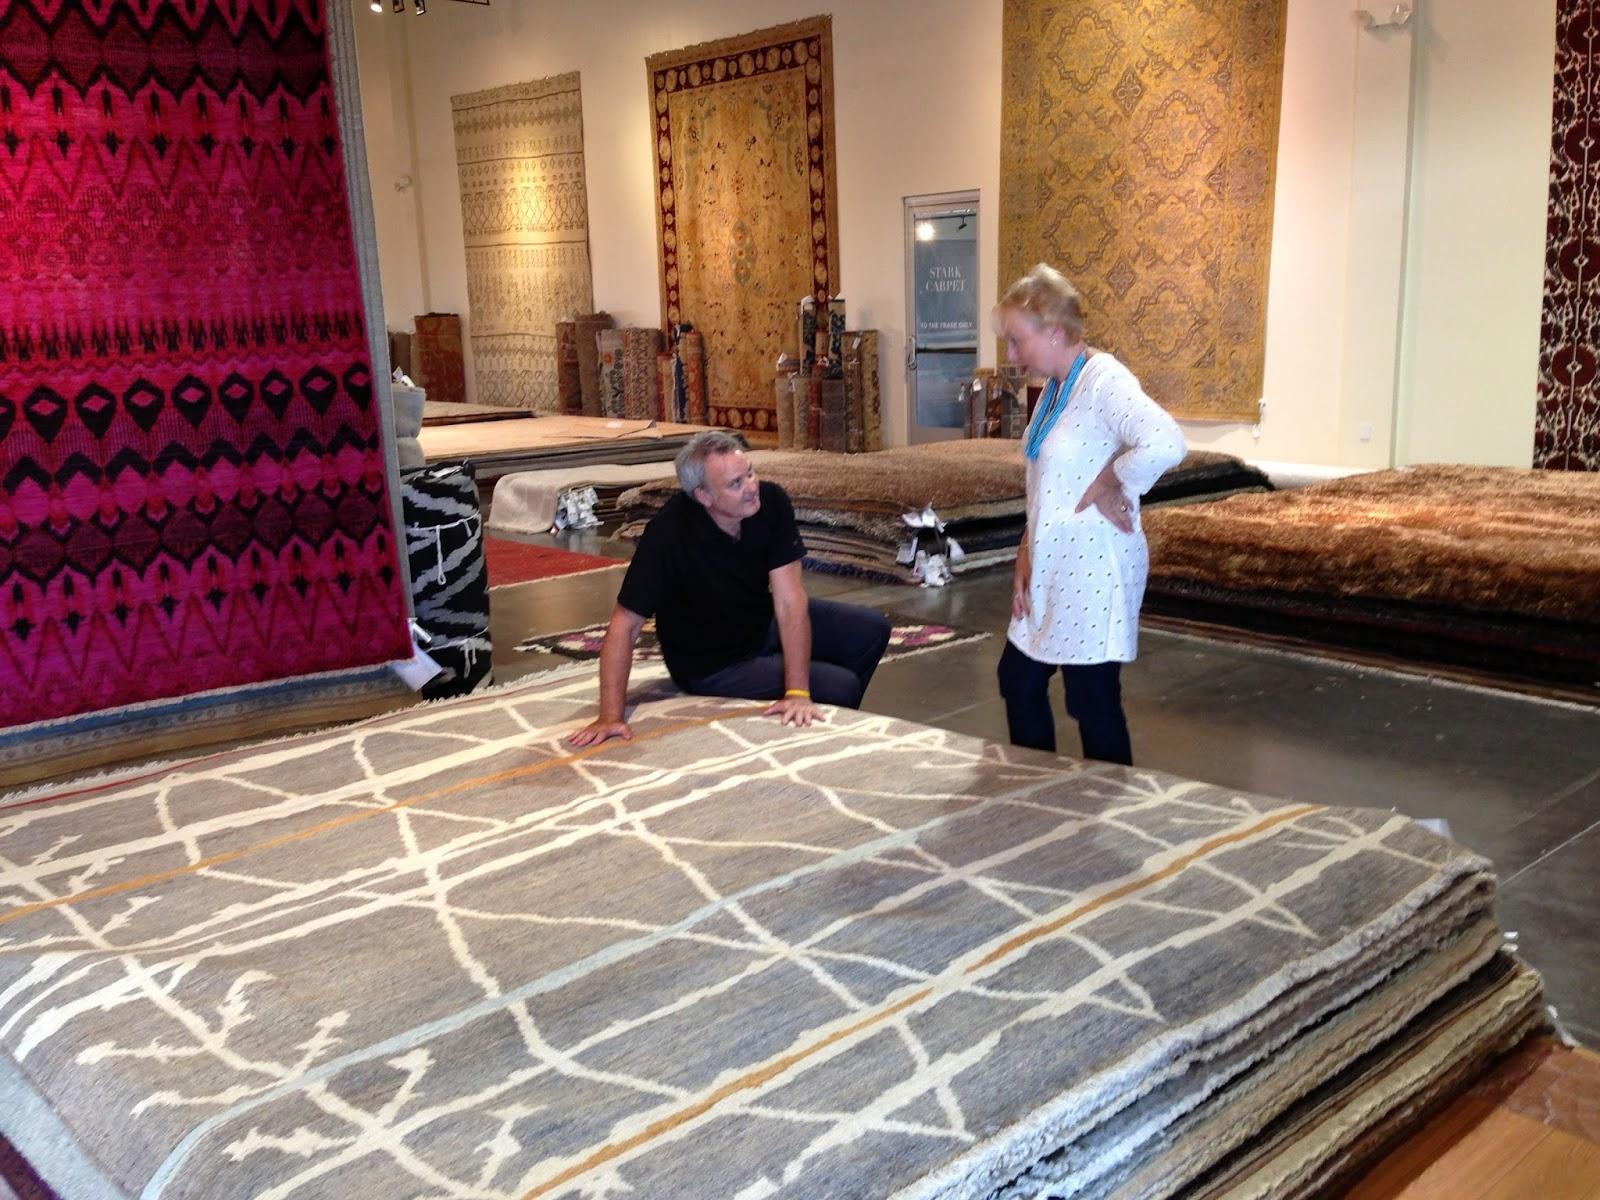 carpet boston carpets stark prices sisal floor for houston rug rugs decor your interior captivating